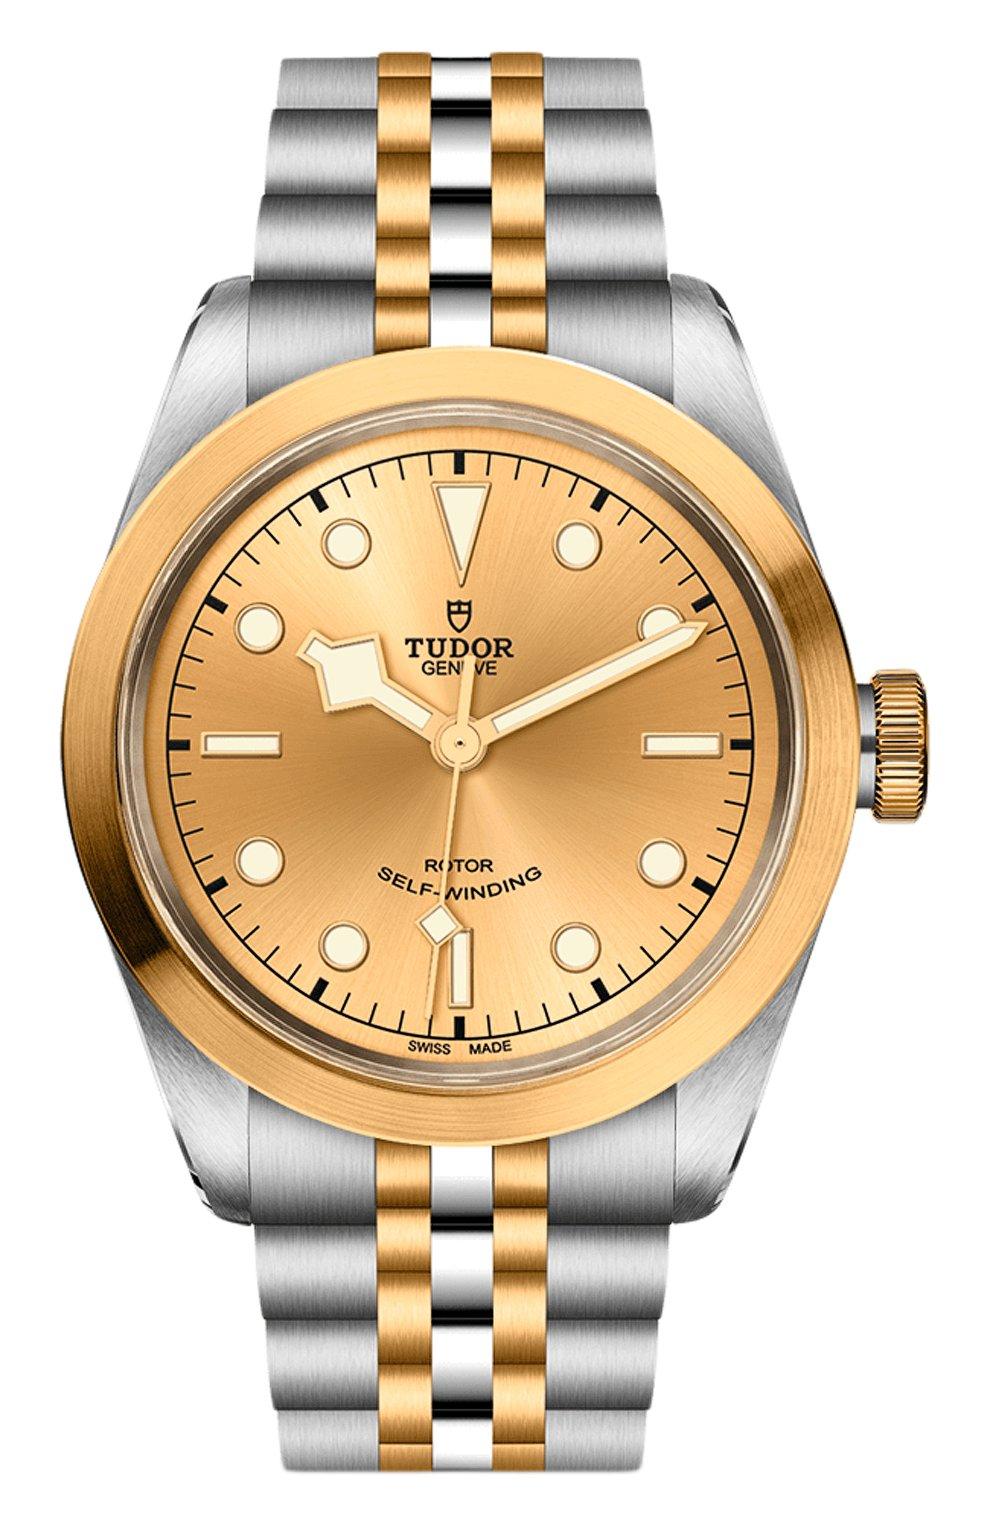 Мужские часы black bay 41 s&g TUDOR бежевого цвета, арт. 79543/65383/CHAMPAGNE | Фото 1